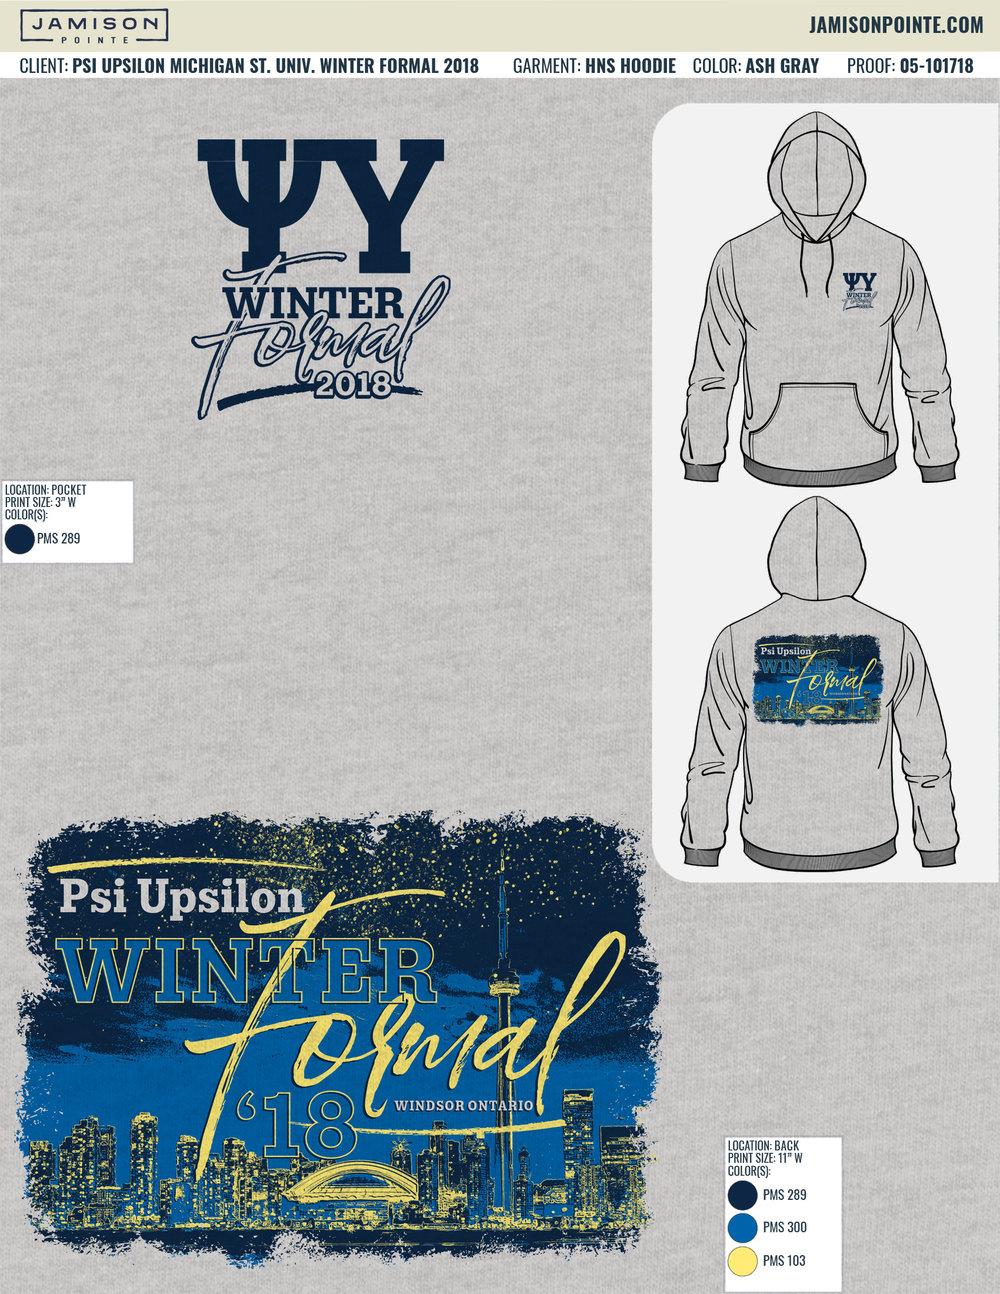 05-101718 Psi Upsilon Michigan State University Winter Formal 2018.jpg